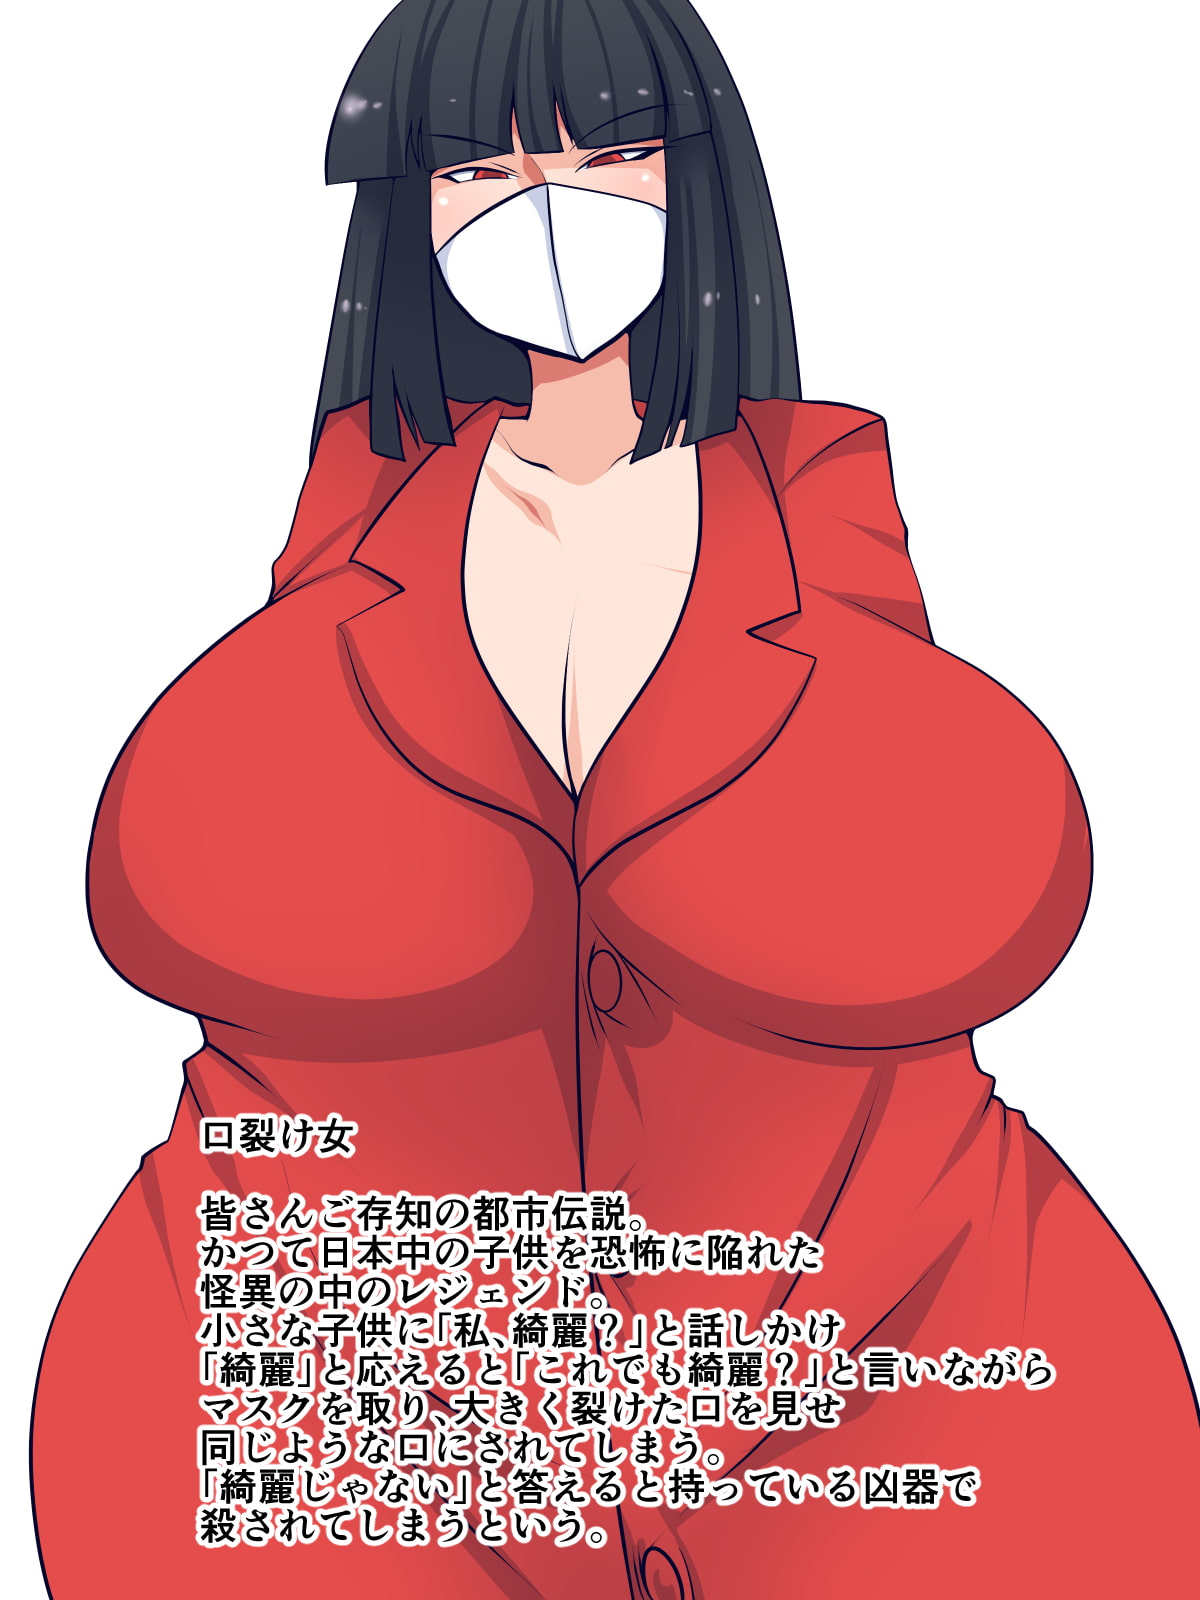 RJ323201 口裂け女VS巨根ショタ [20210406]